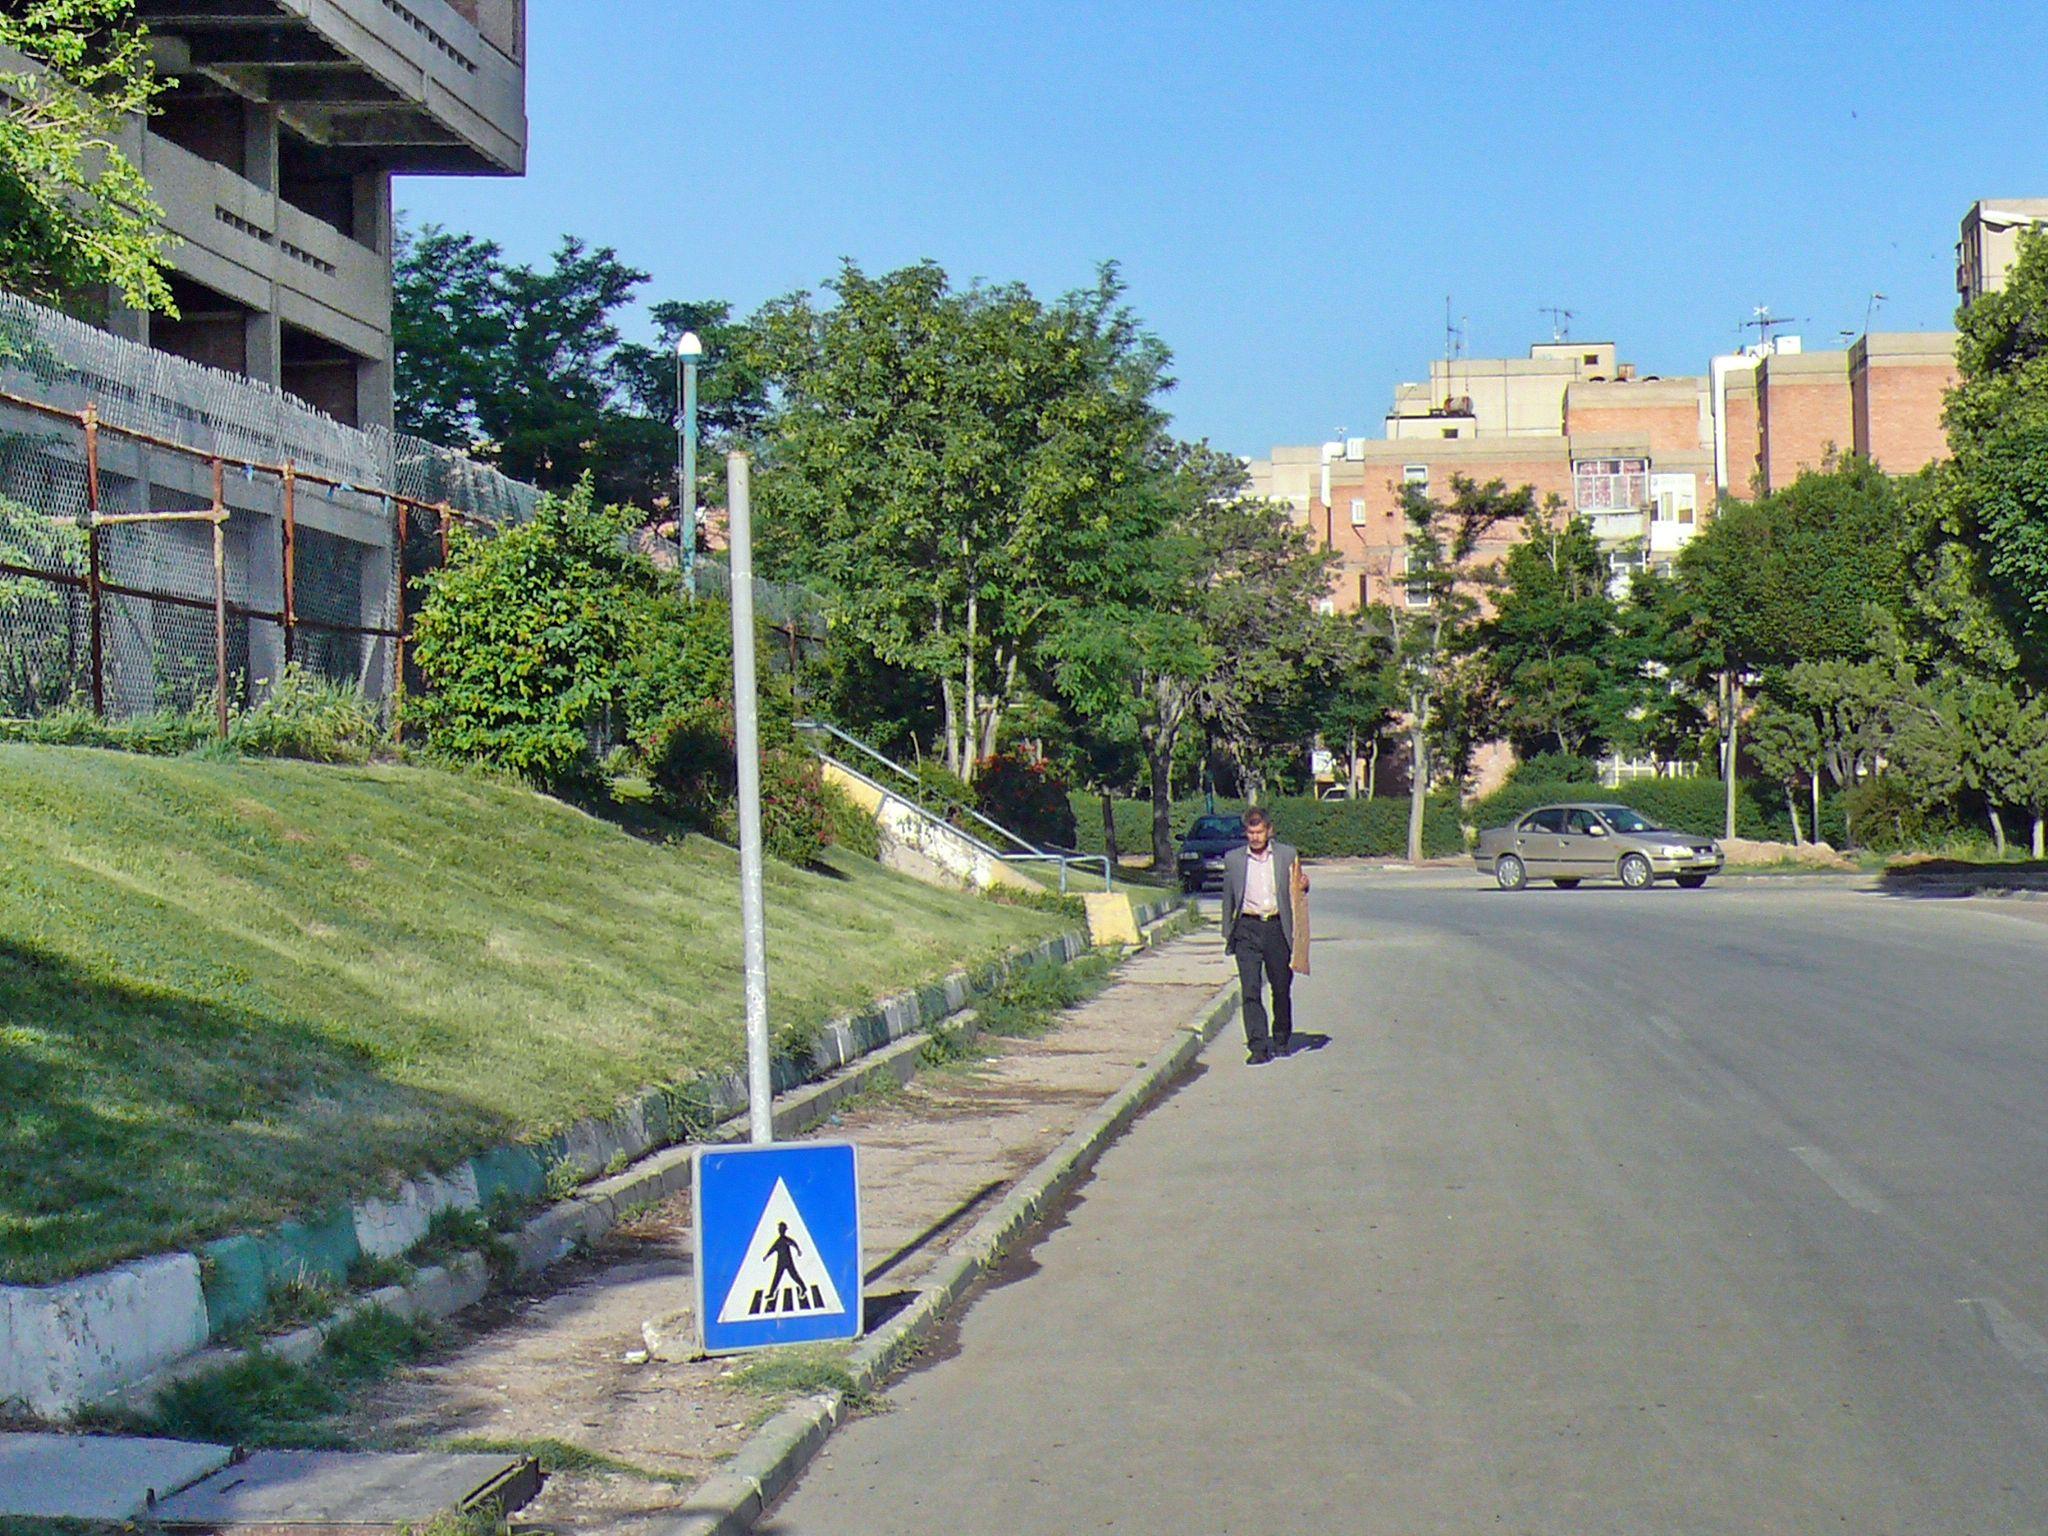 Pedestrian crossing sign!!! by Aahmad Hezavei